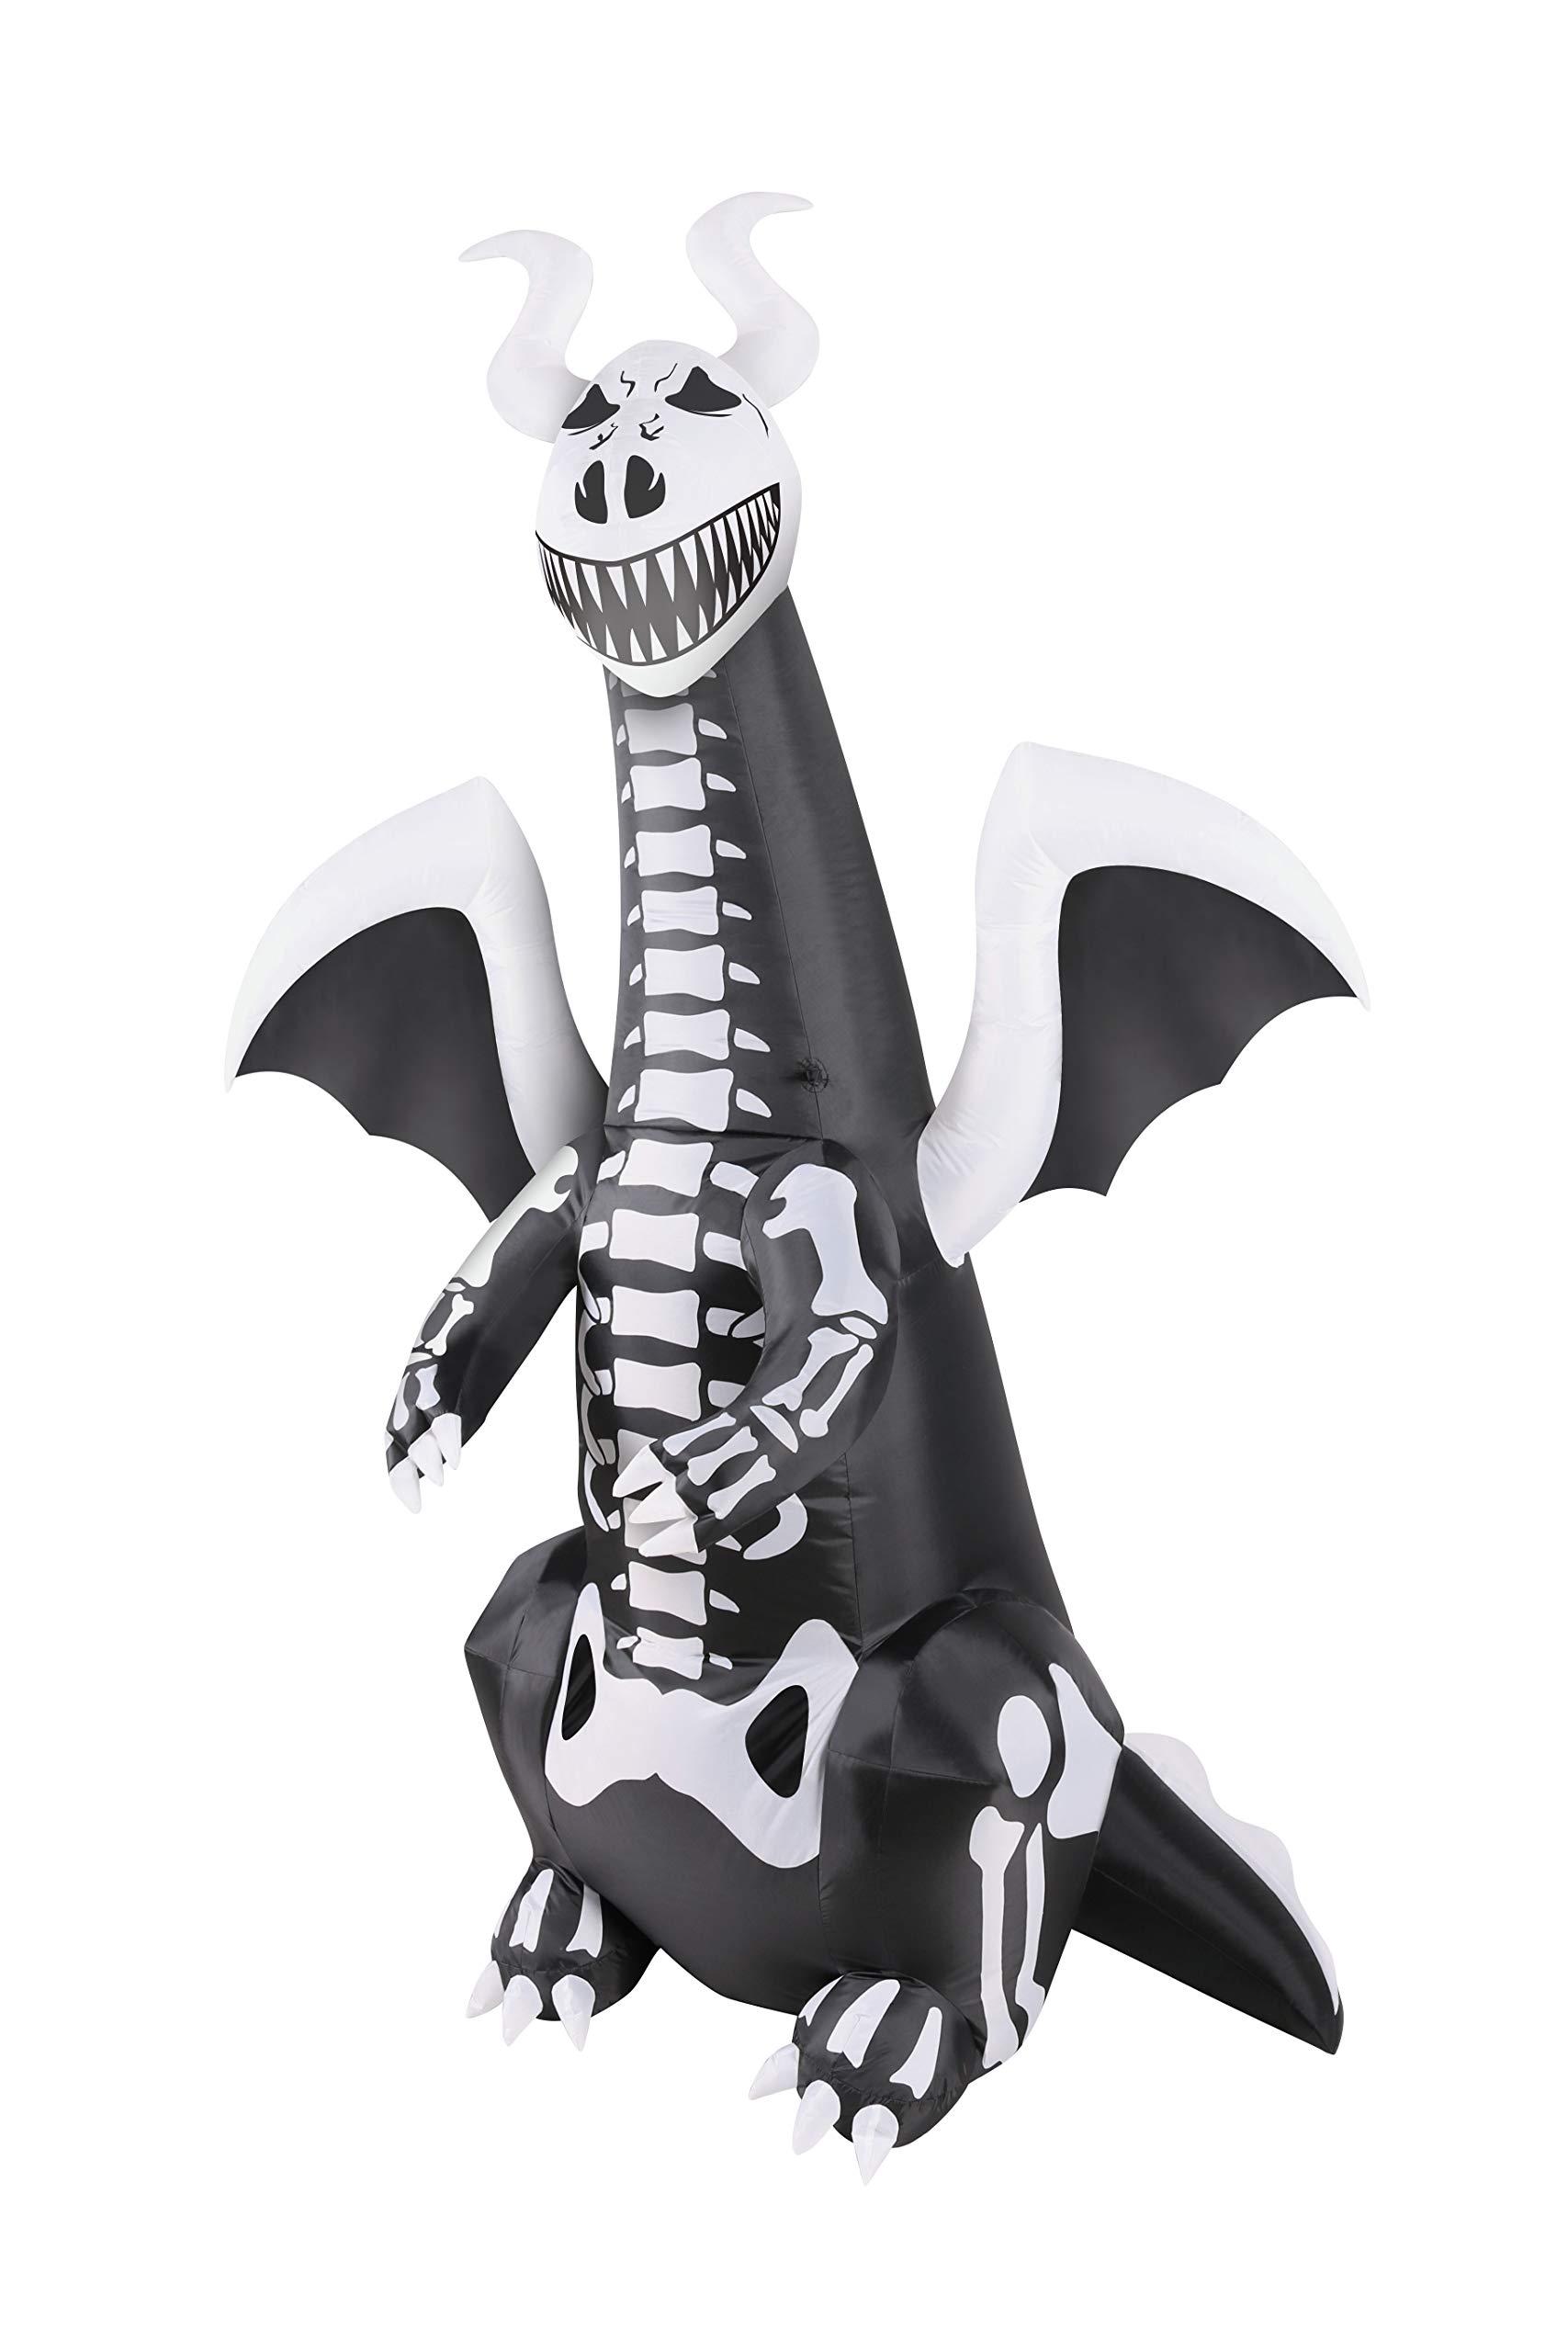 BANZAI 7' Inflatable Skeleton Dragon by BANZAI